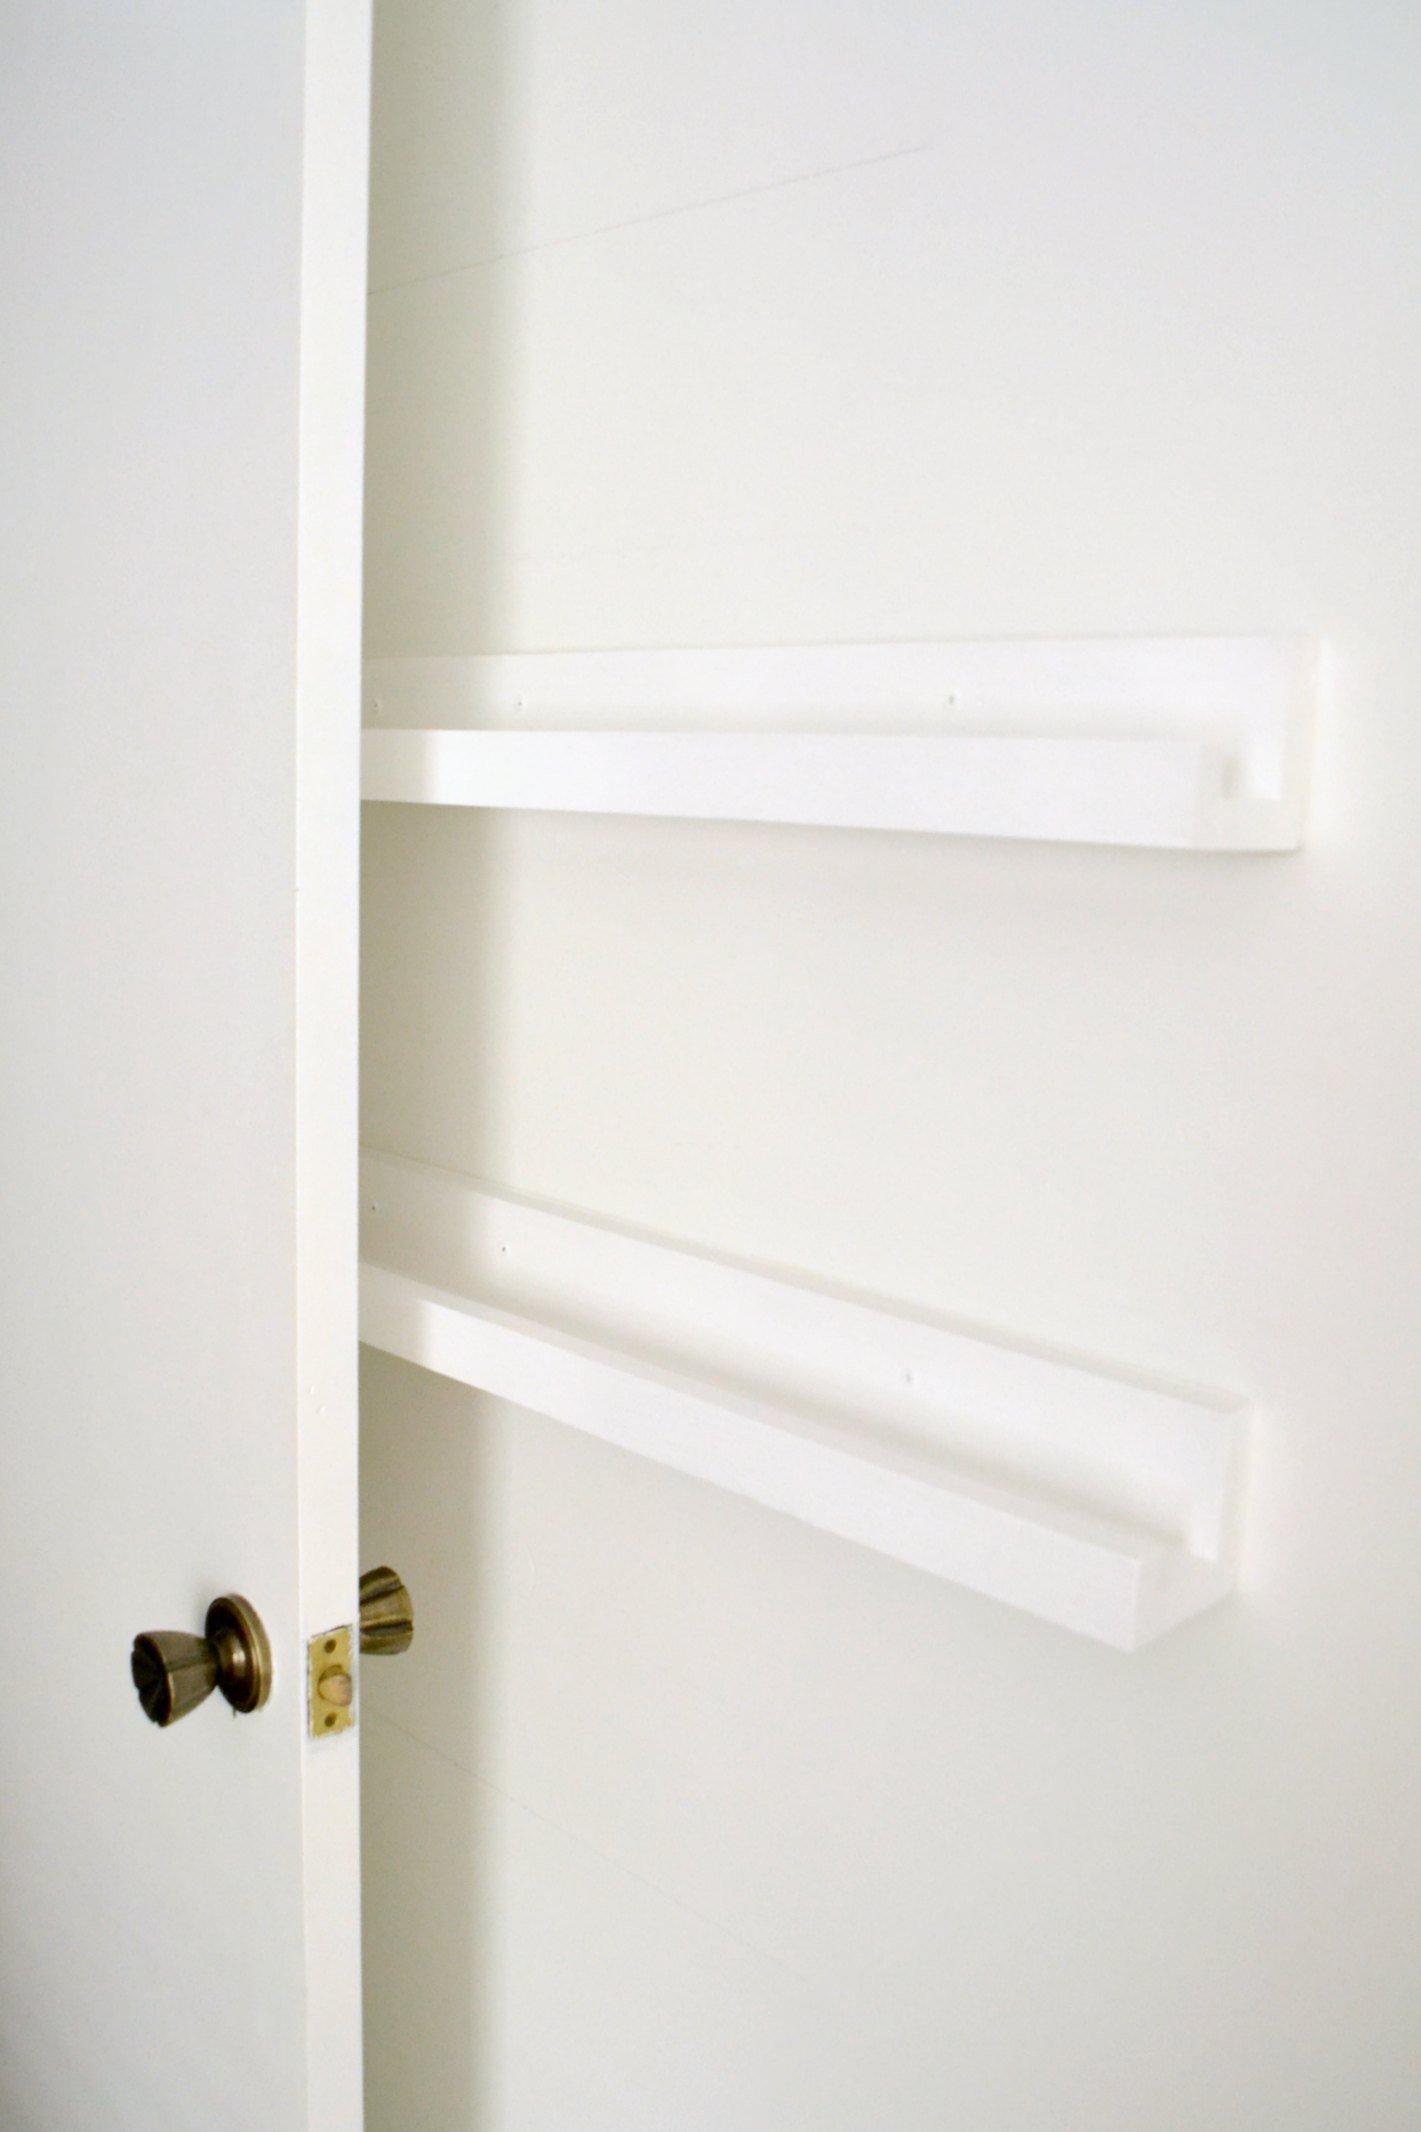 blank diy storage shelves behind the door